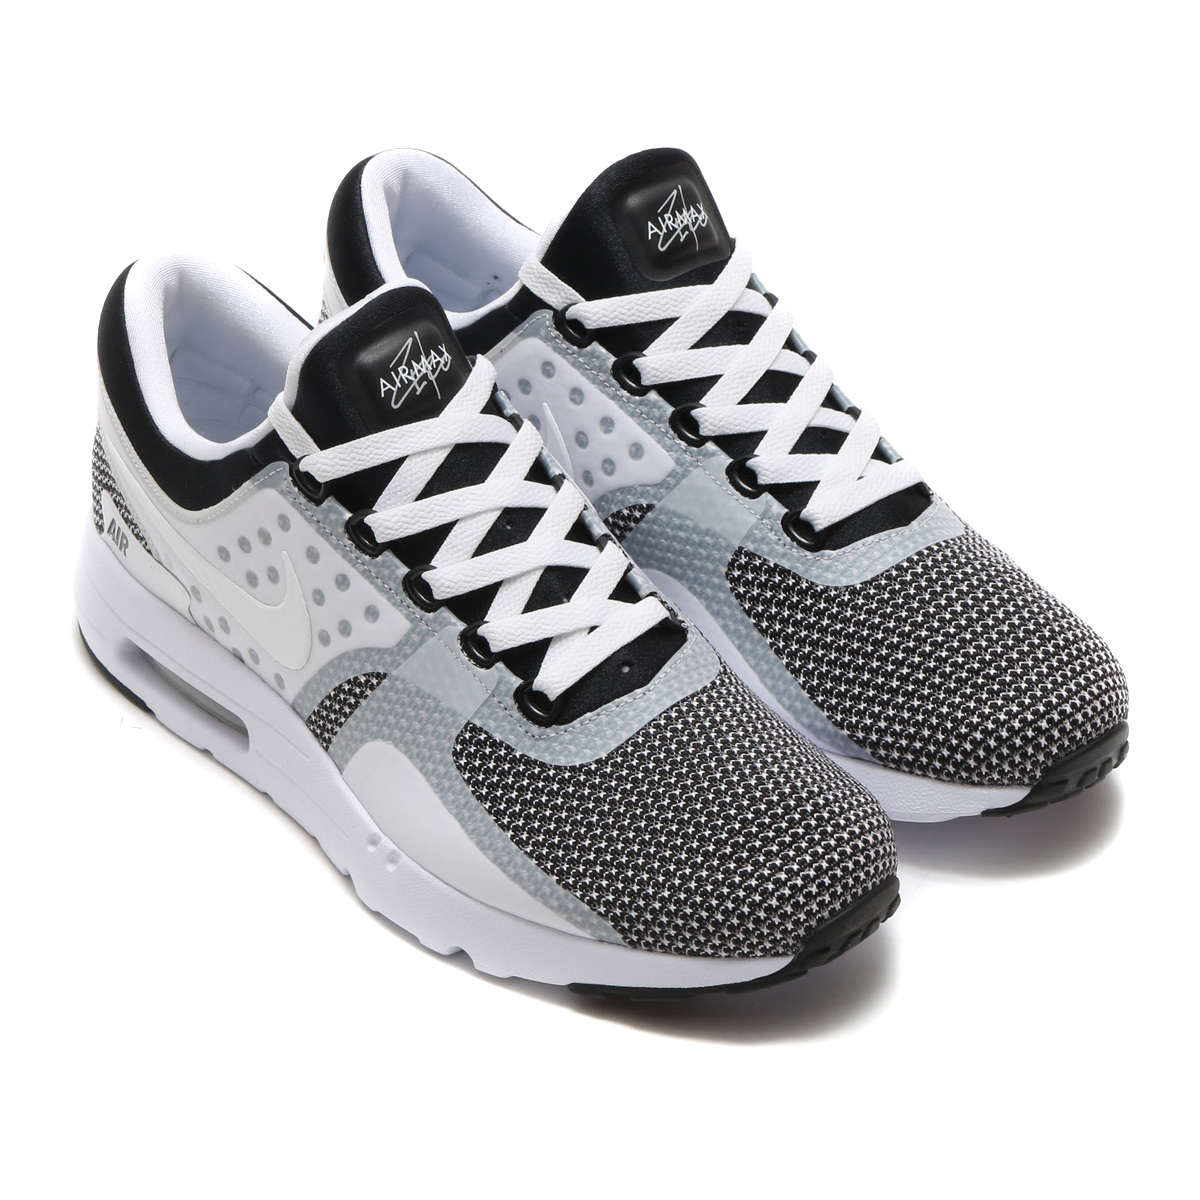 Nike Air Max Zero Essential 005 876070 005 |